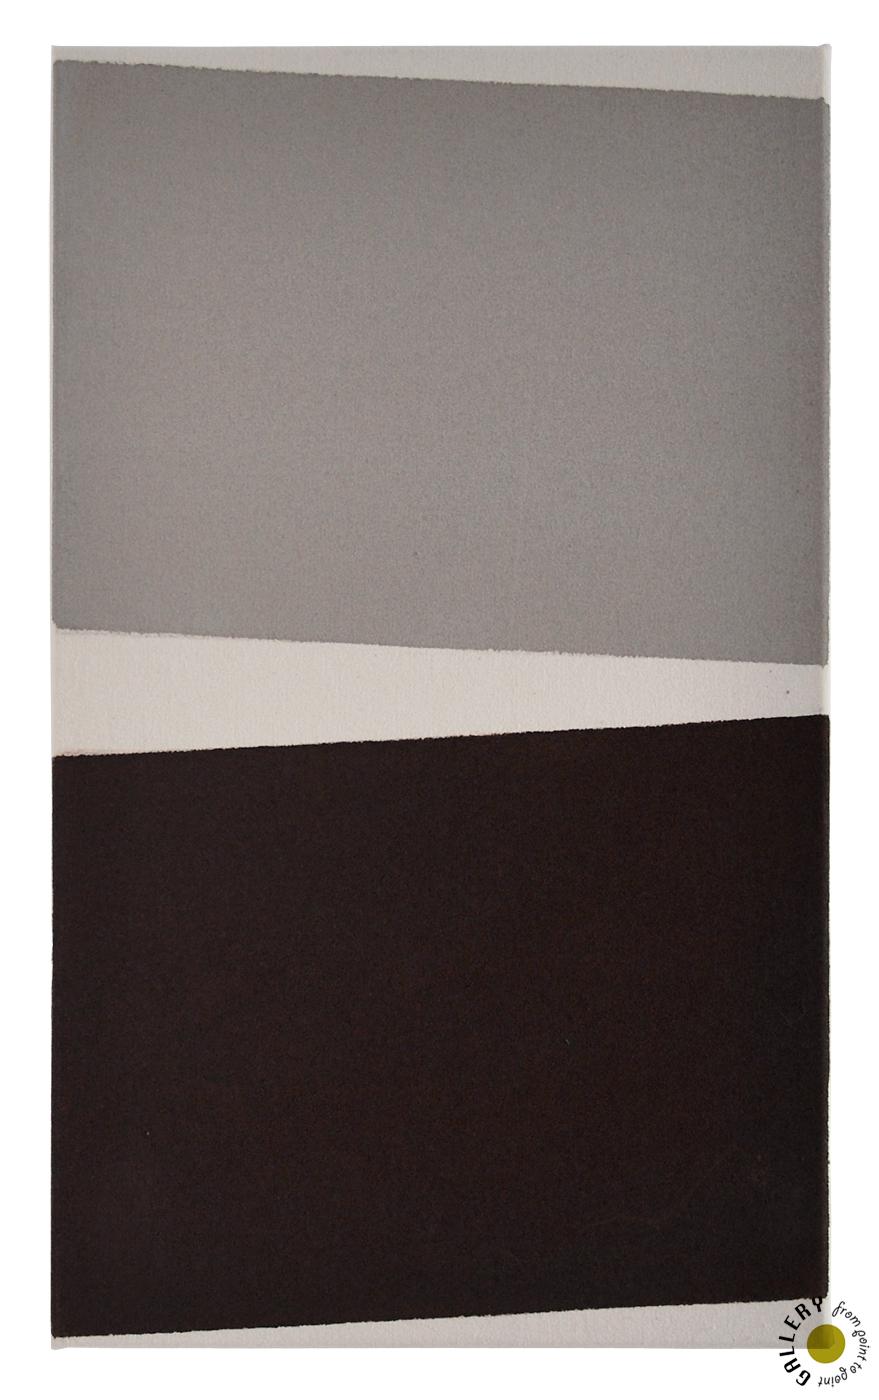 Guillaume-Moschini-Peinture-Gris-Brun-Point-to-Point-Studio.jpg